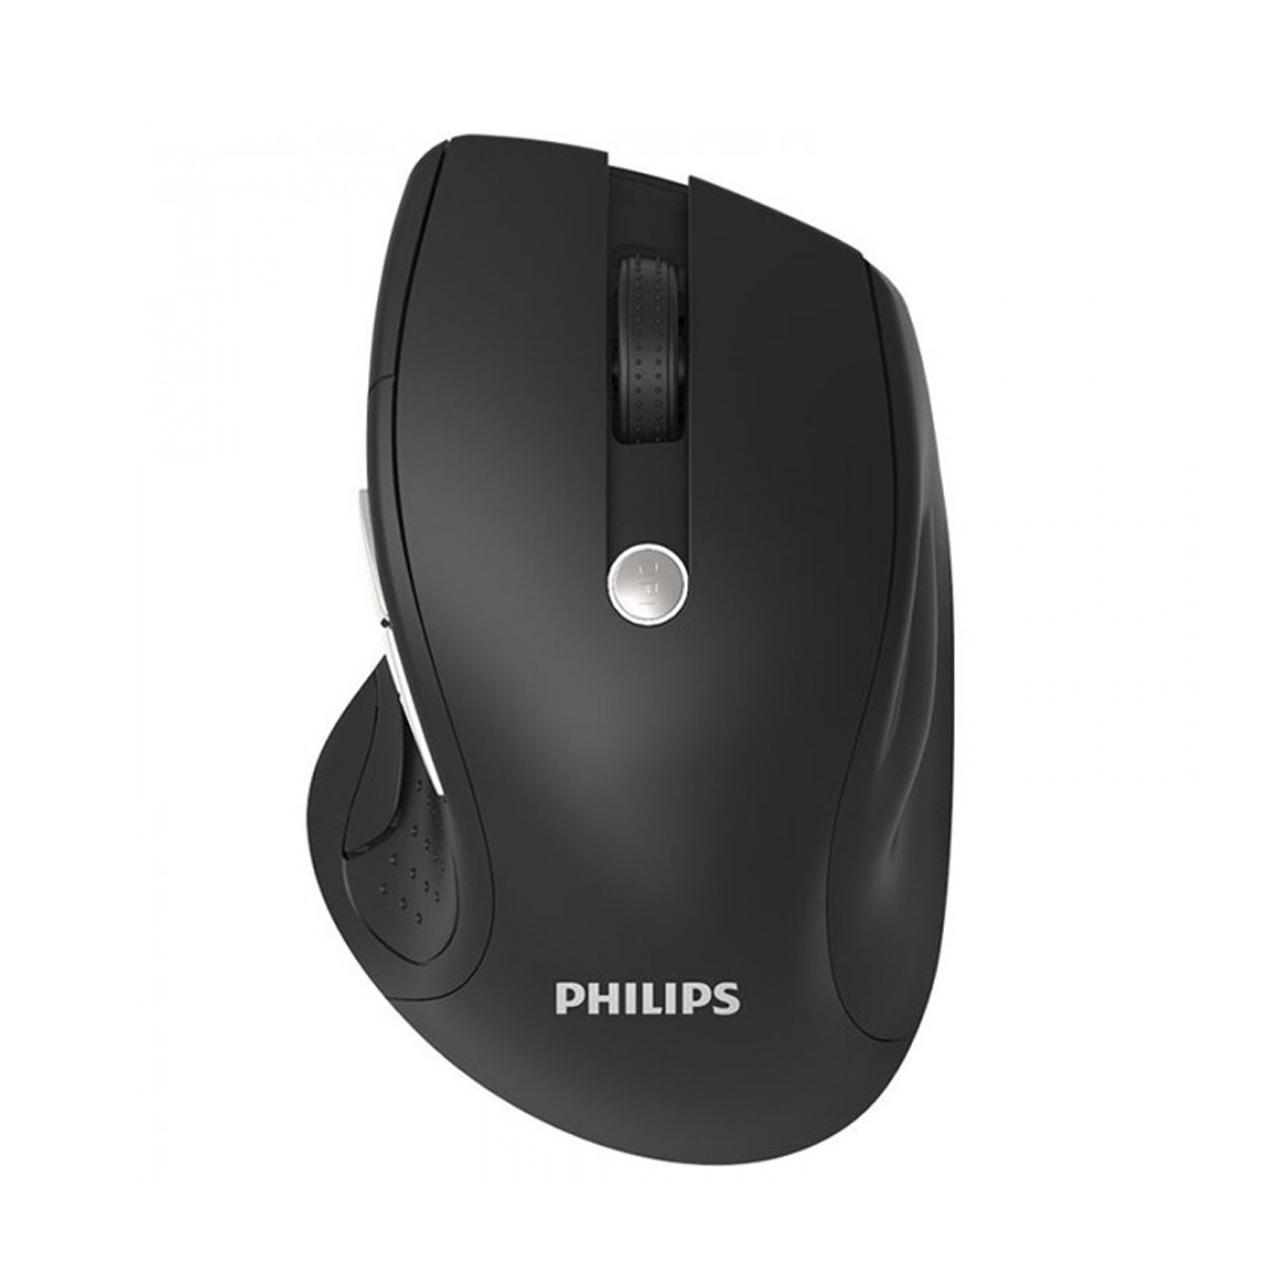 ماوس فیلیپس مدل M505